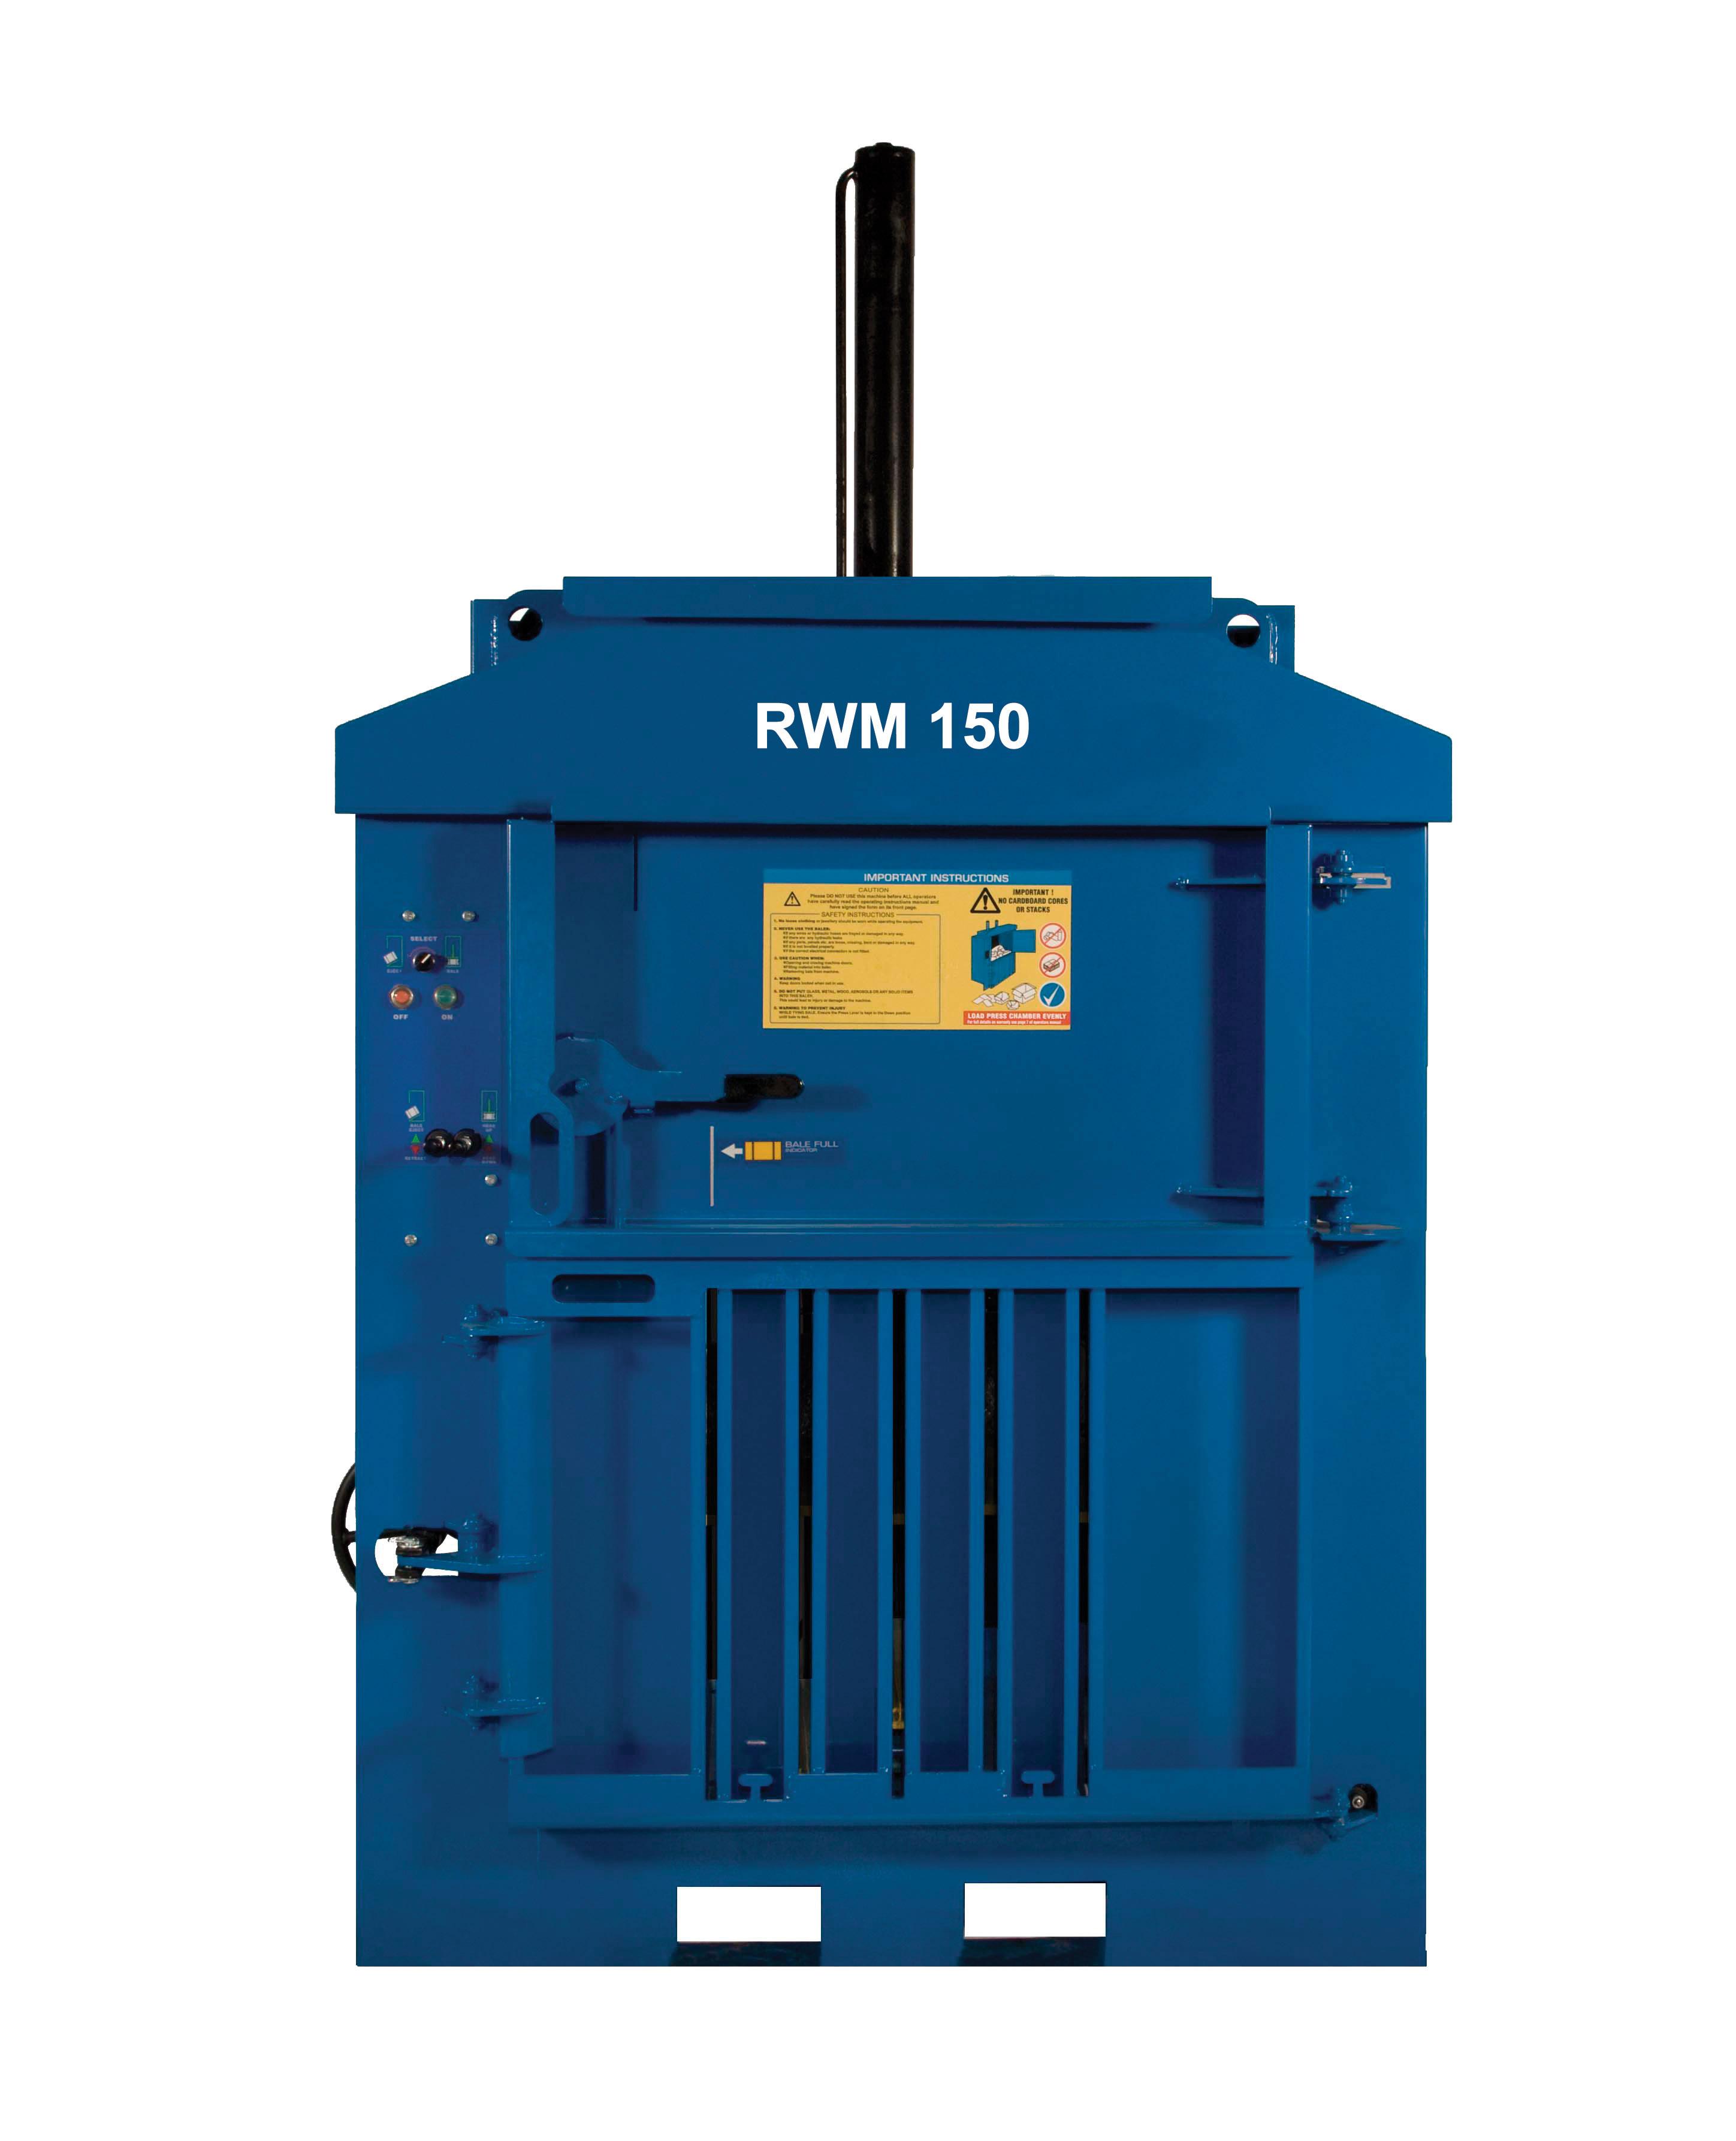 Machine of the month – June – RWM 150